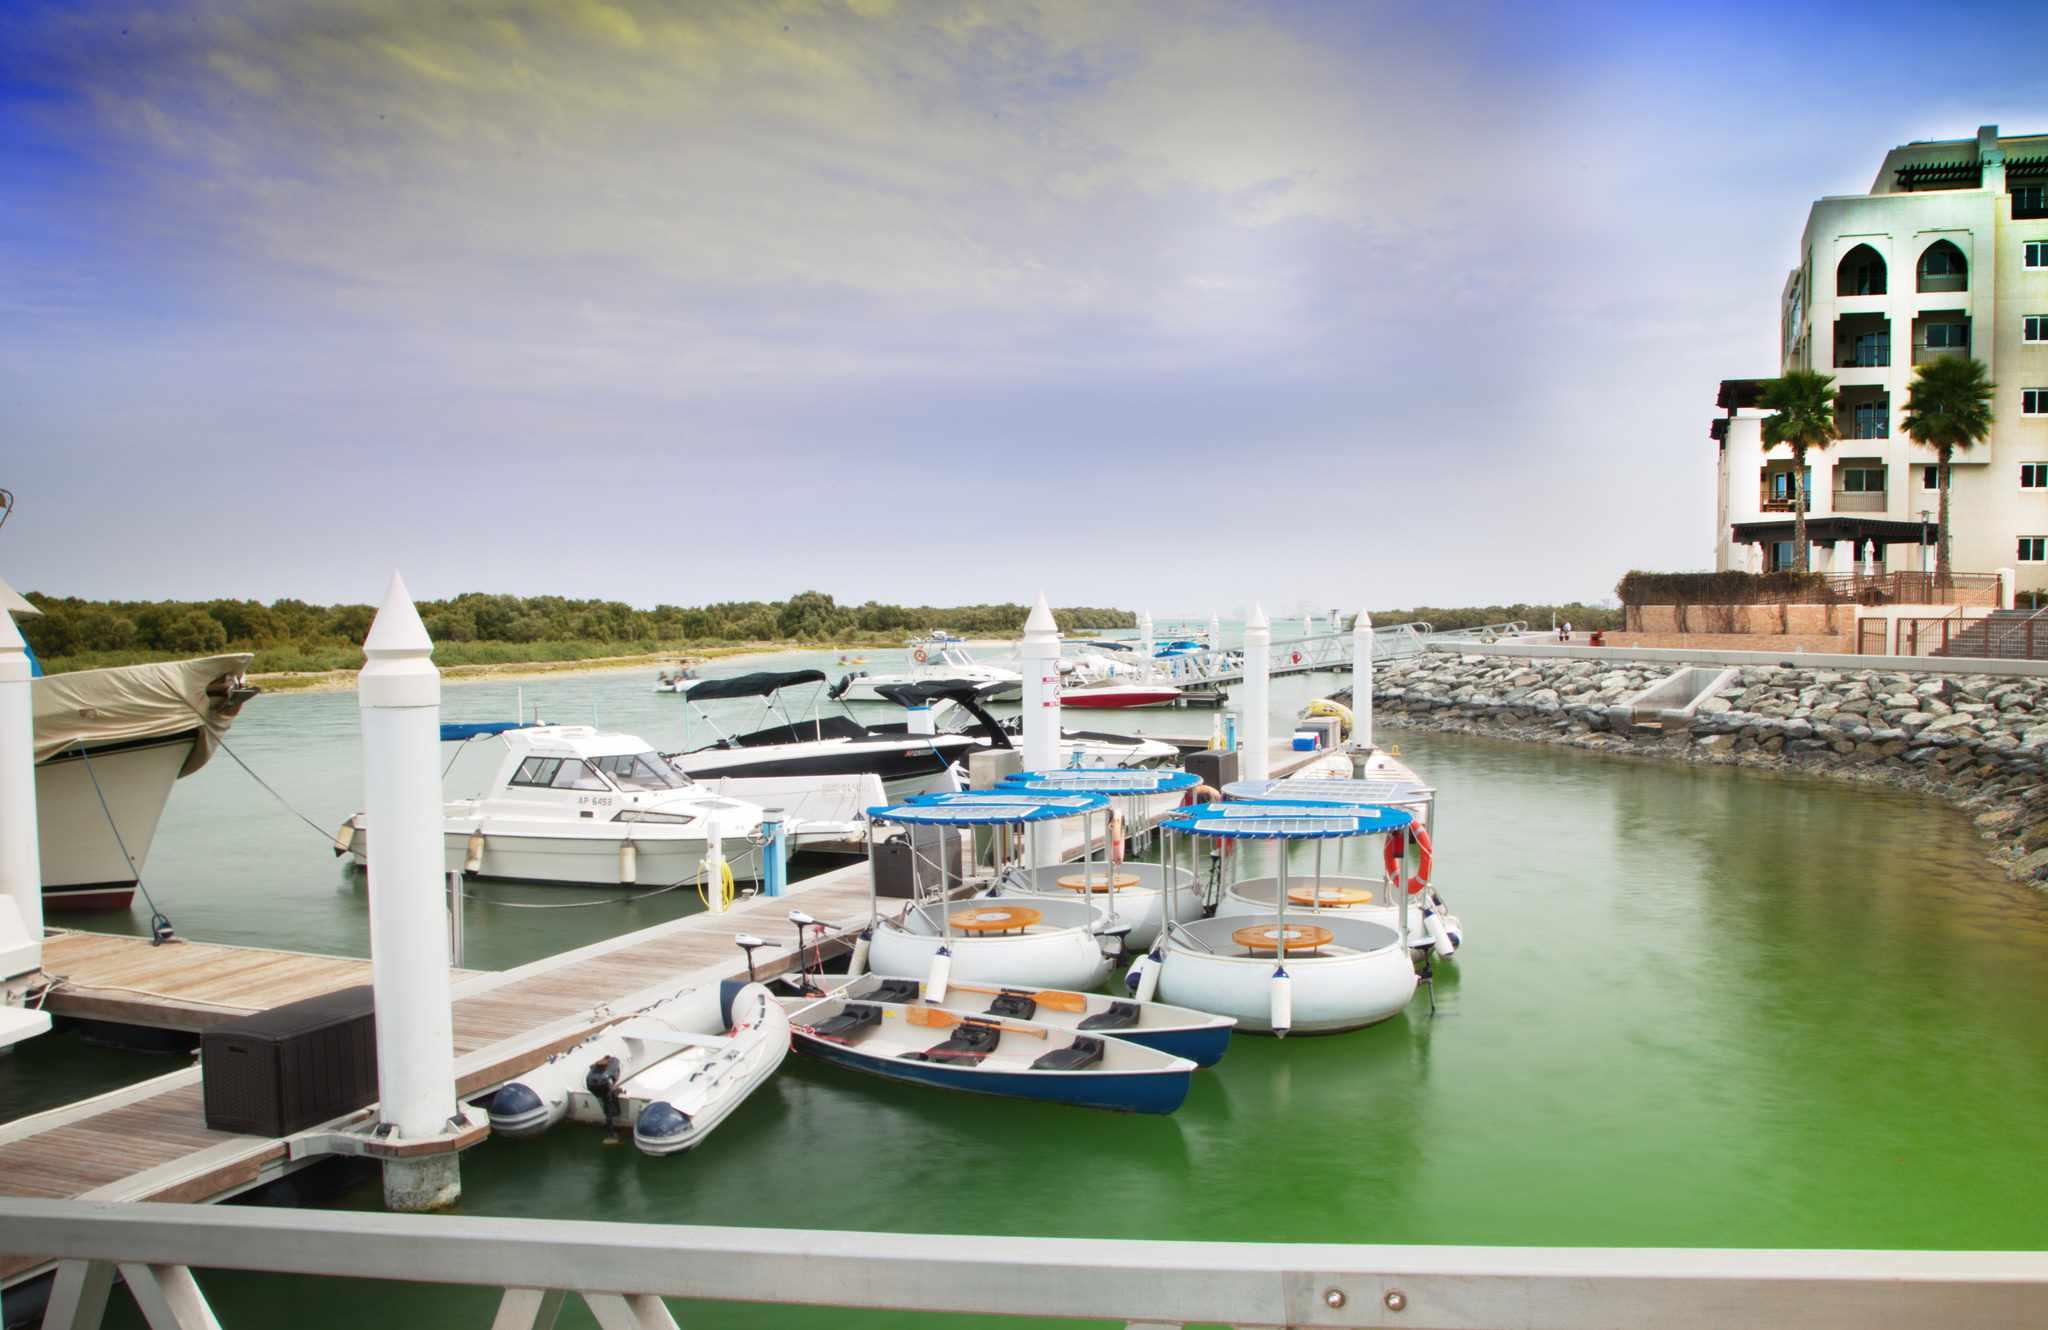 Marina outside of the Eastern Mangroves Hotel and Spa by Anantara.